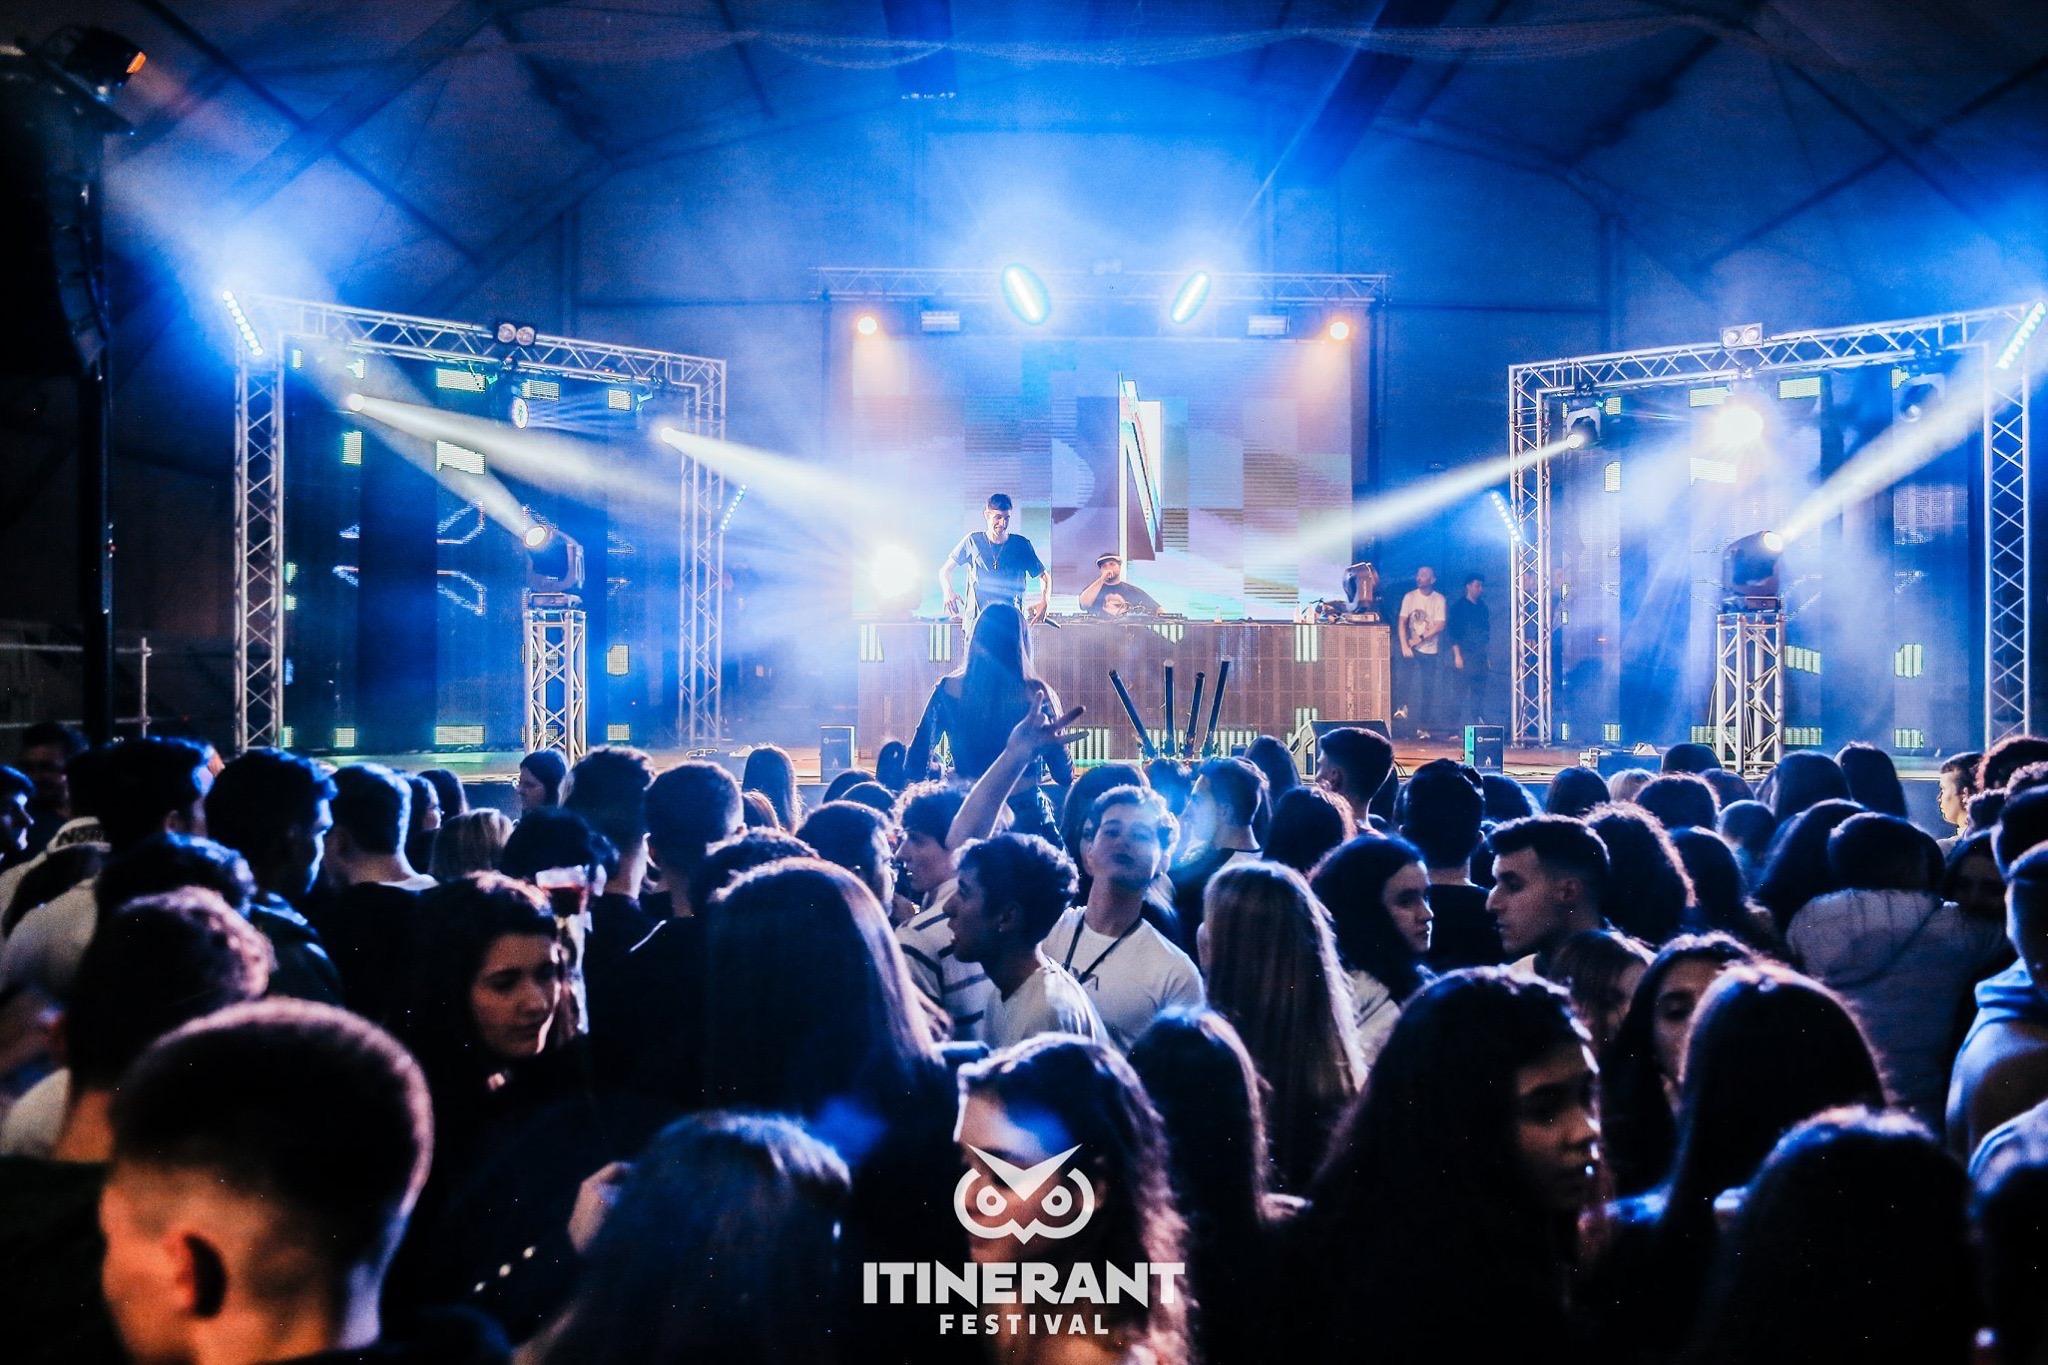 ITINERANT FESTIVAL